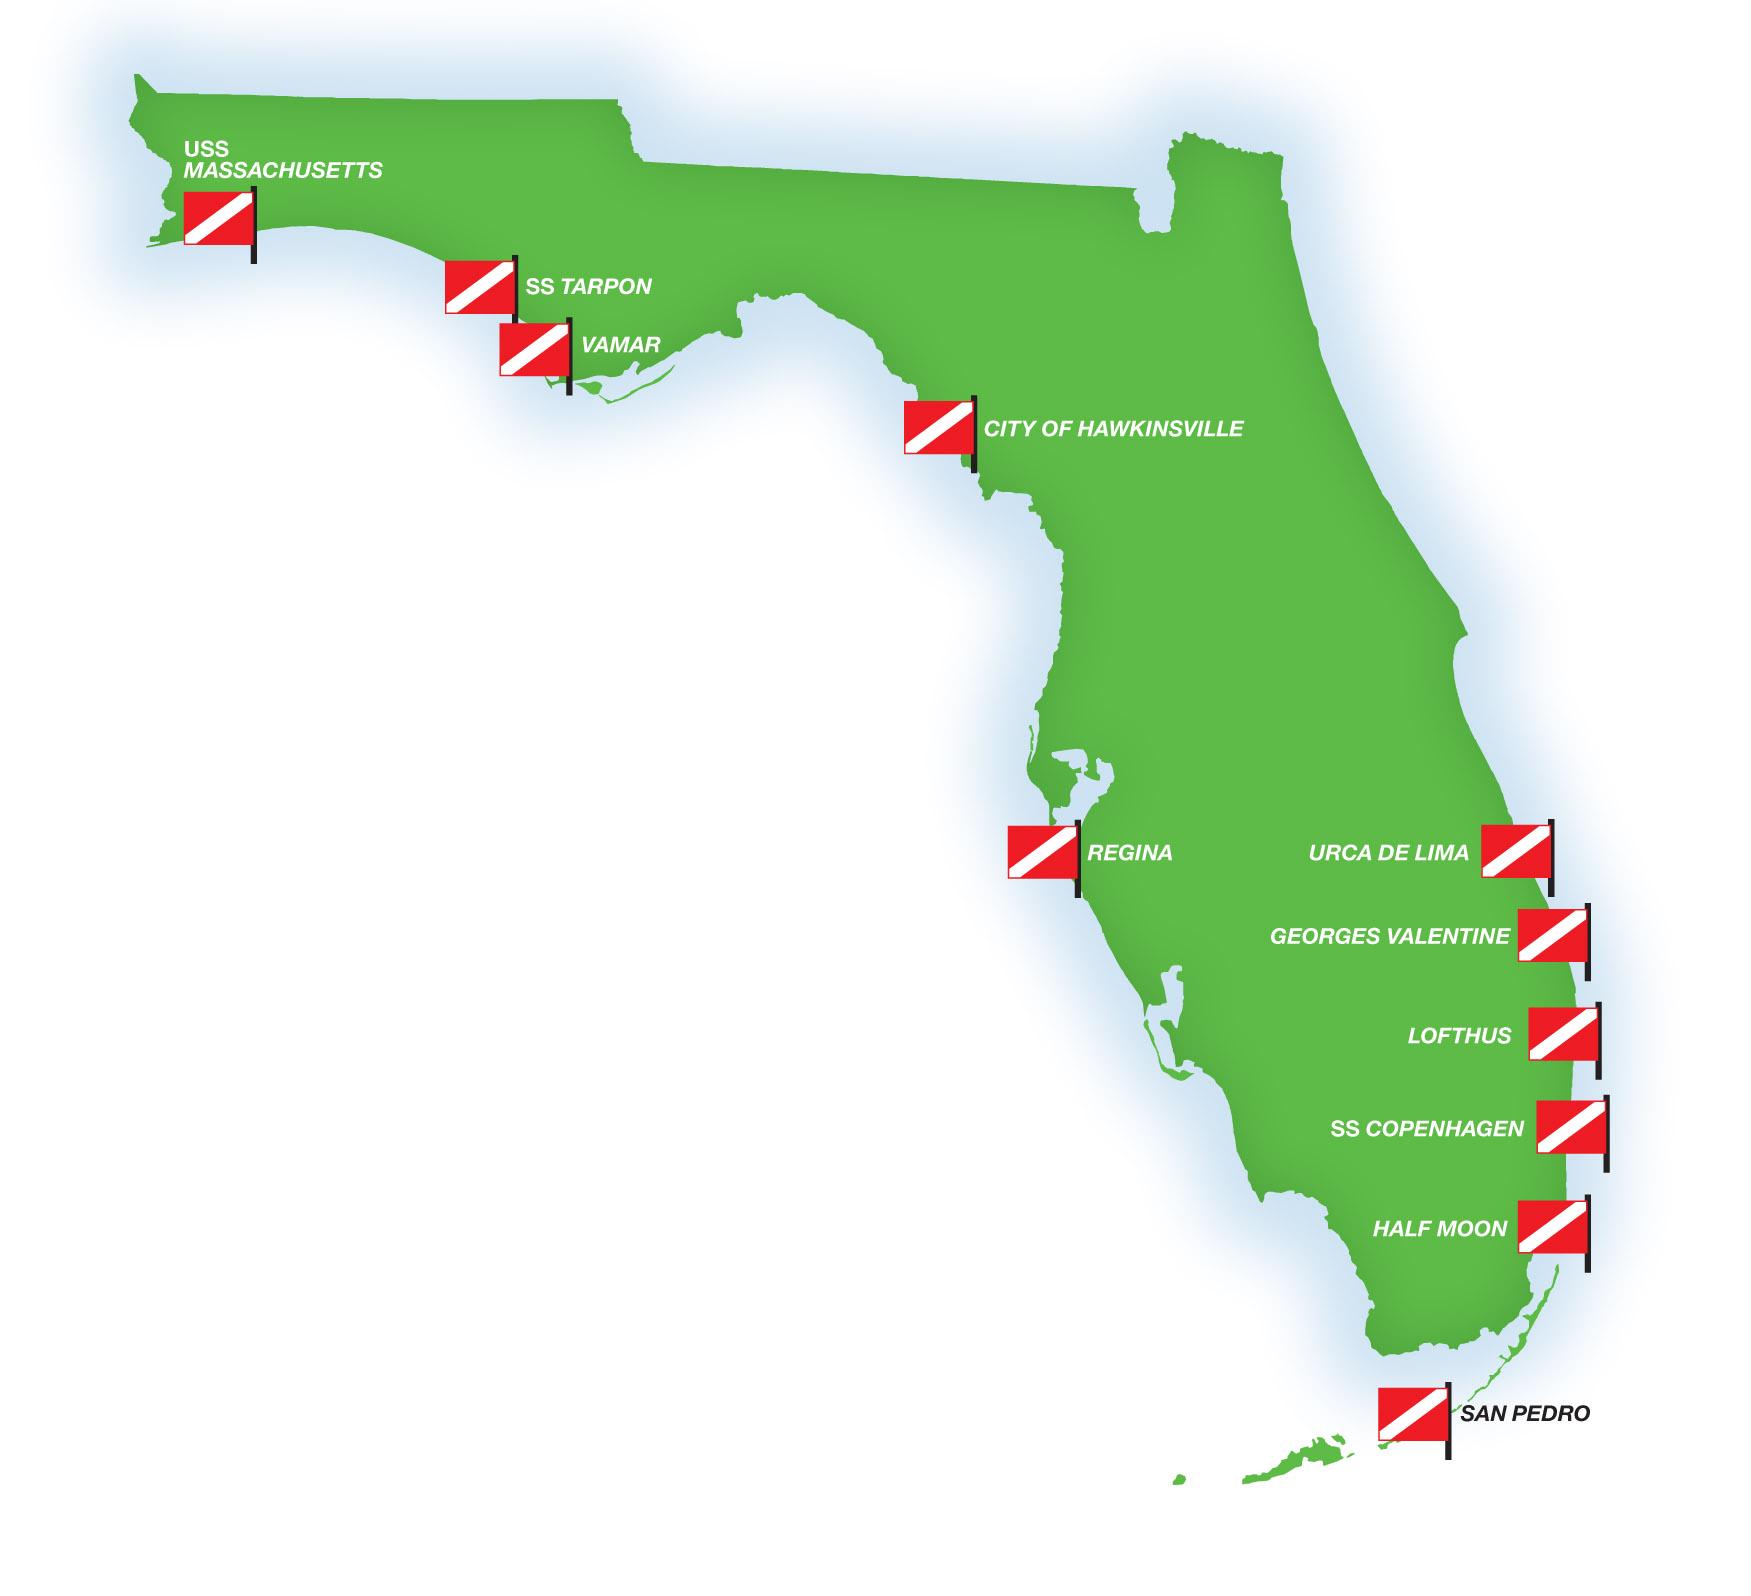 Florida Shipwrecks Map.Florida S Shipwrecks Museums In The Sea Diver Magazine